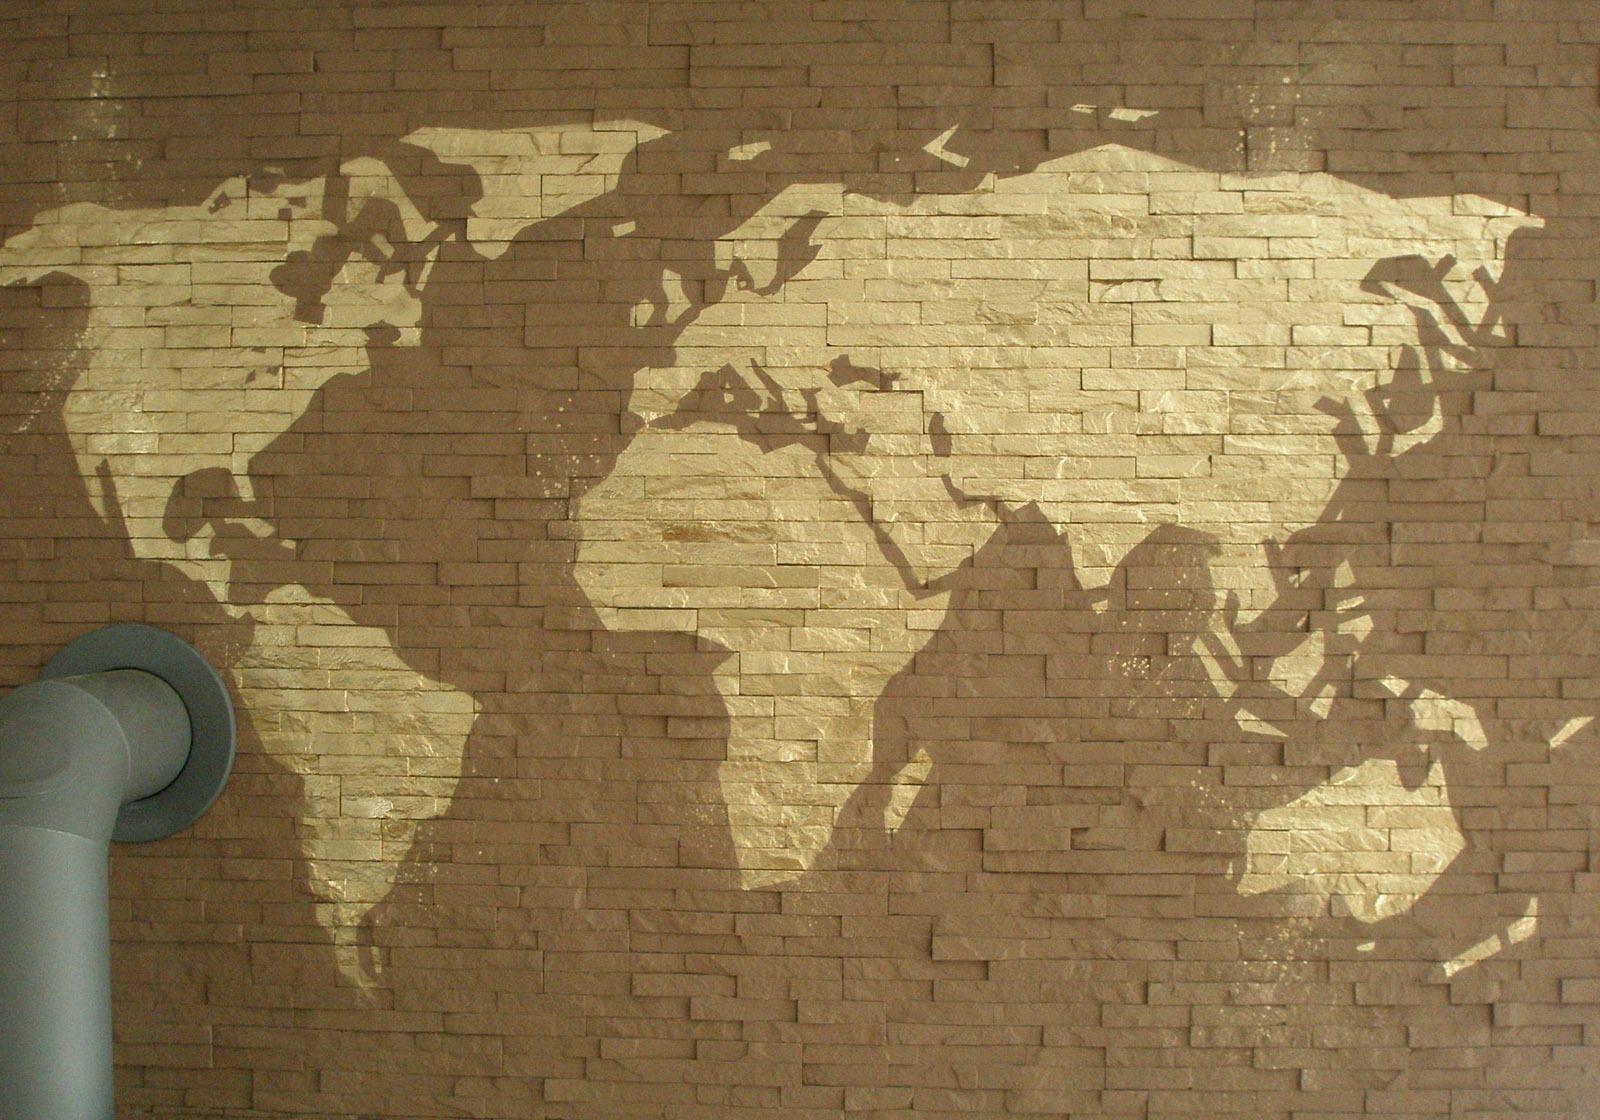 graffitiauftrag-graffitikuenstler-weltkarte-2013-innen-gold-folie-privat